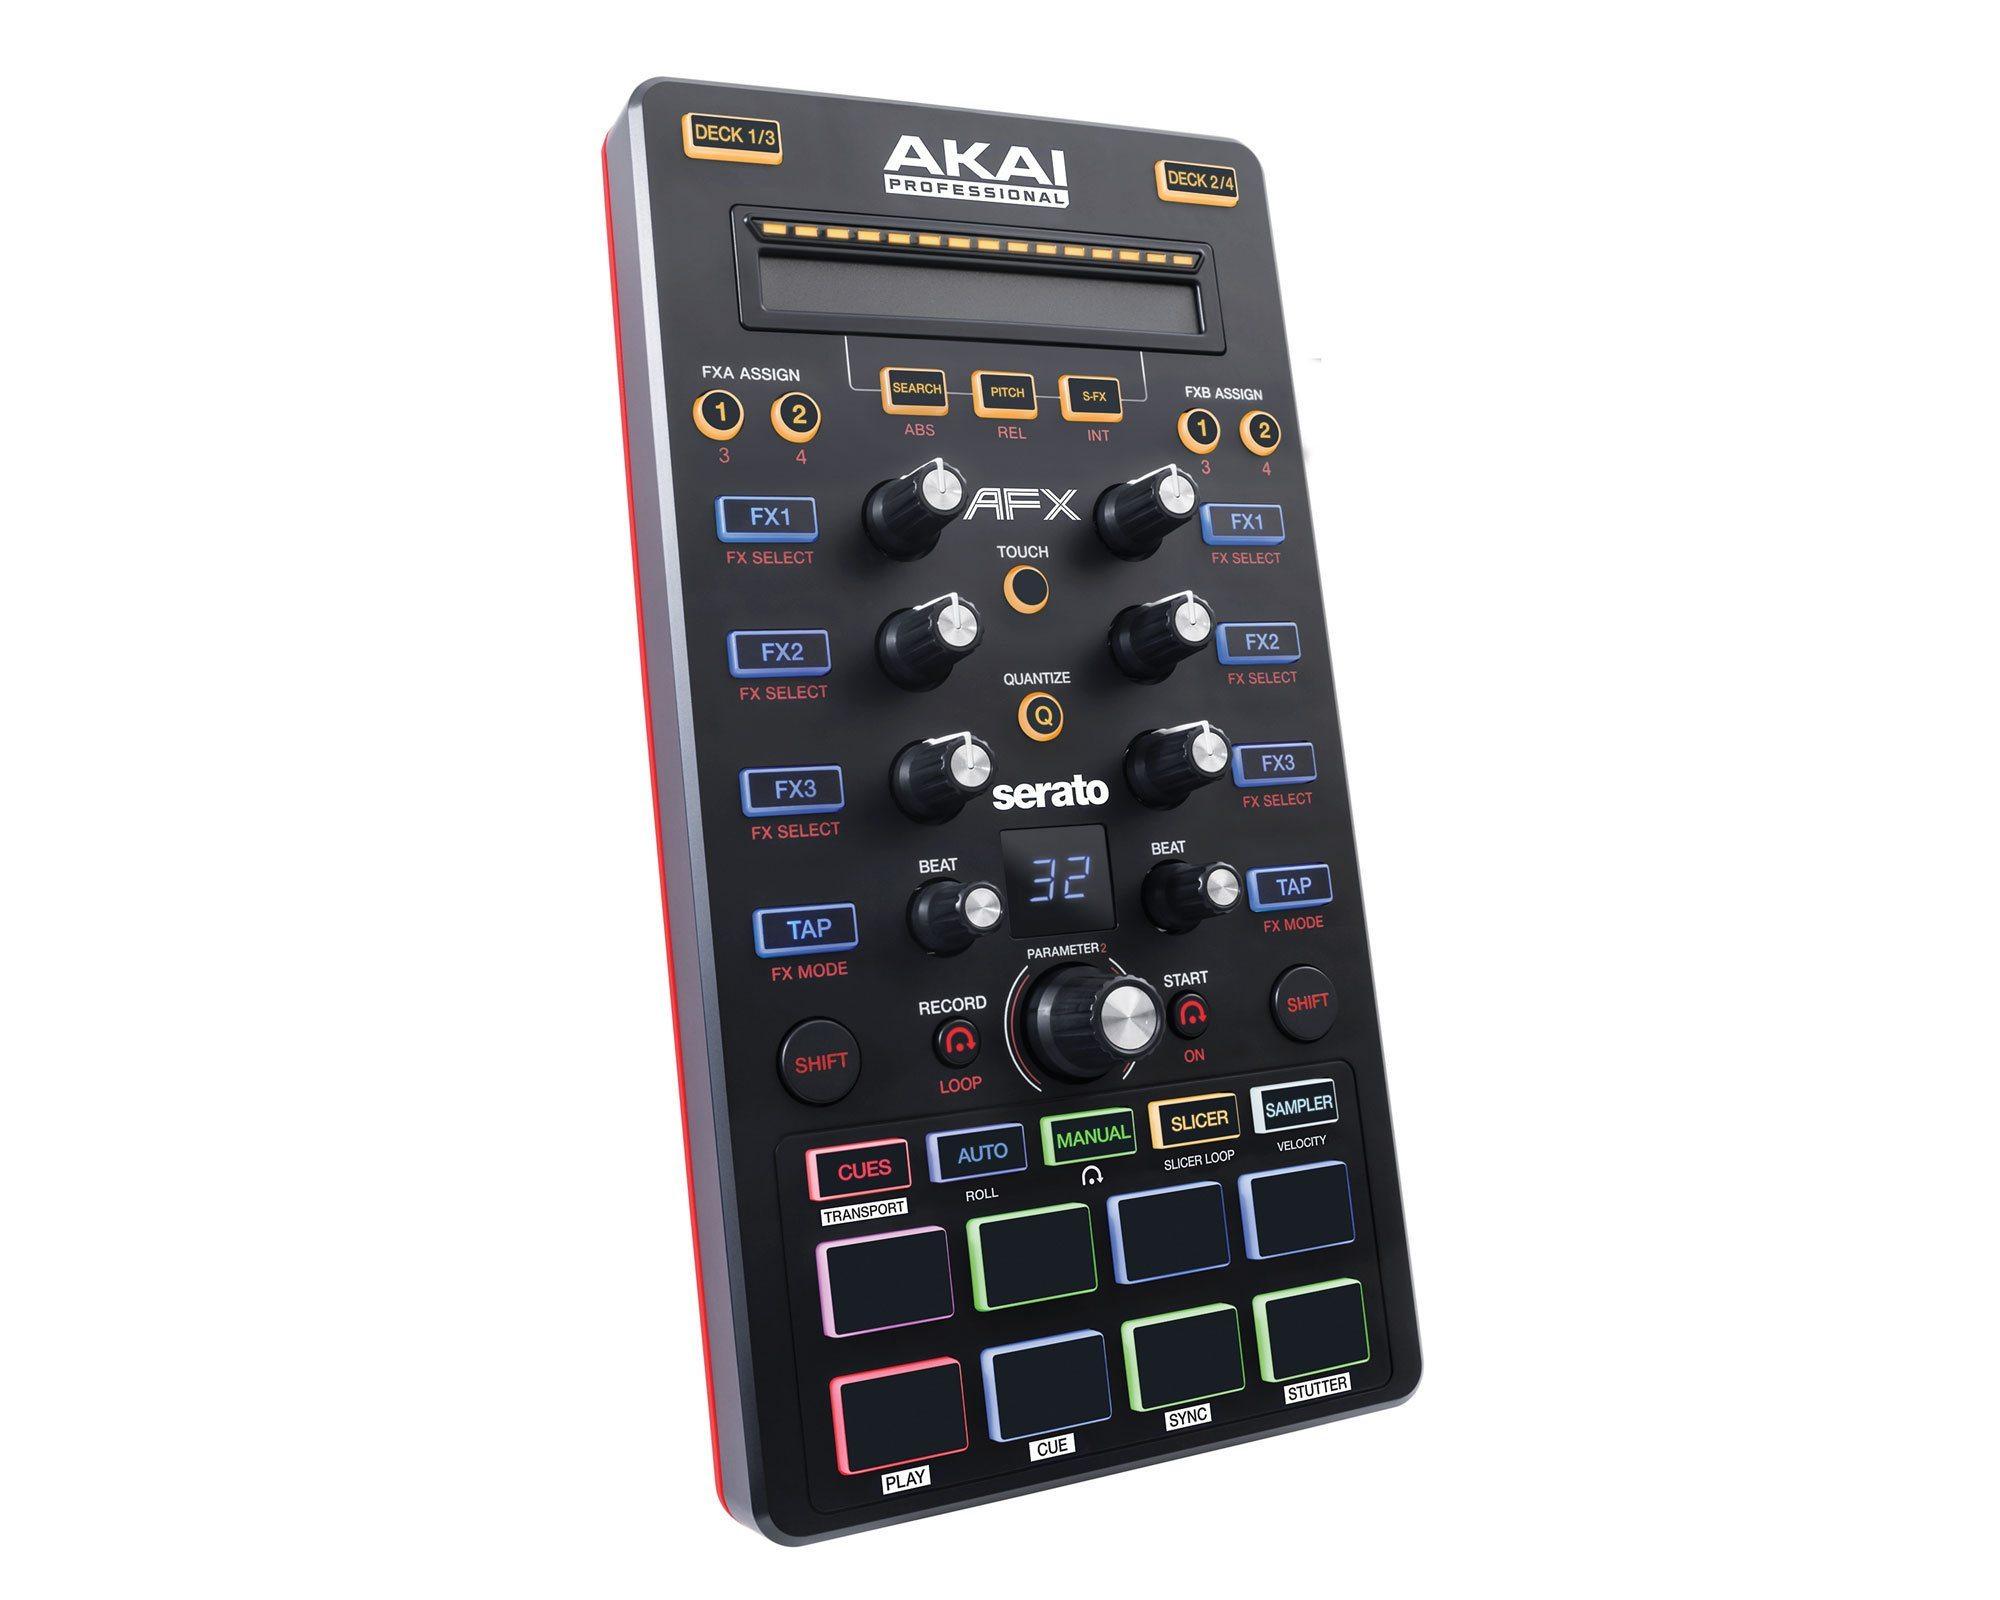 Akai Pro Amx And Afx Bringing Serato To Producers Djworx